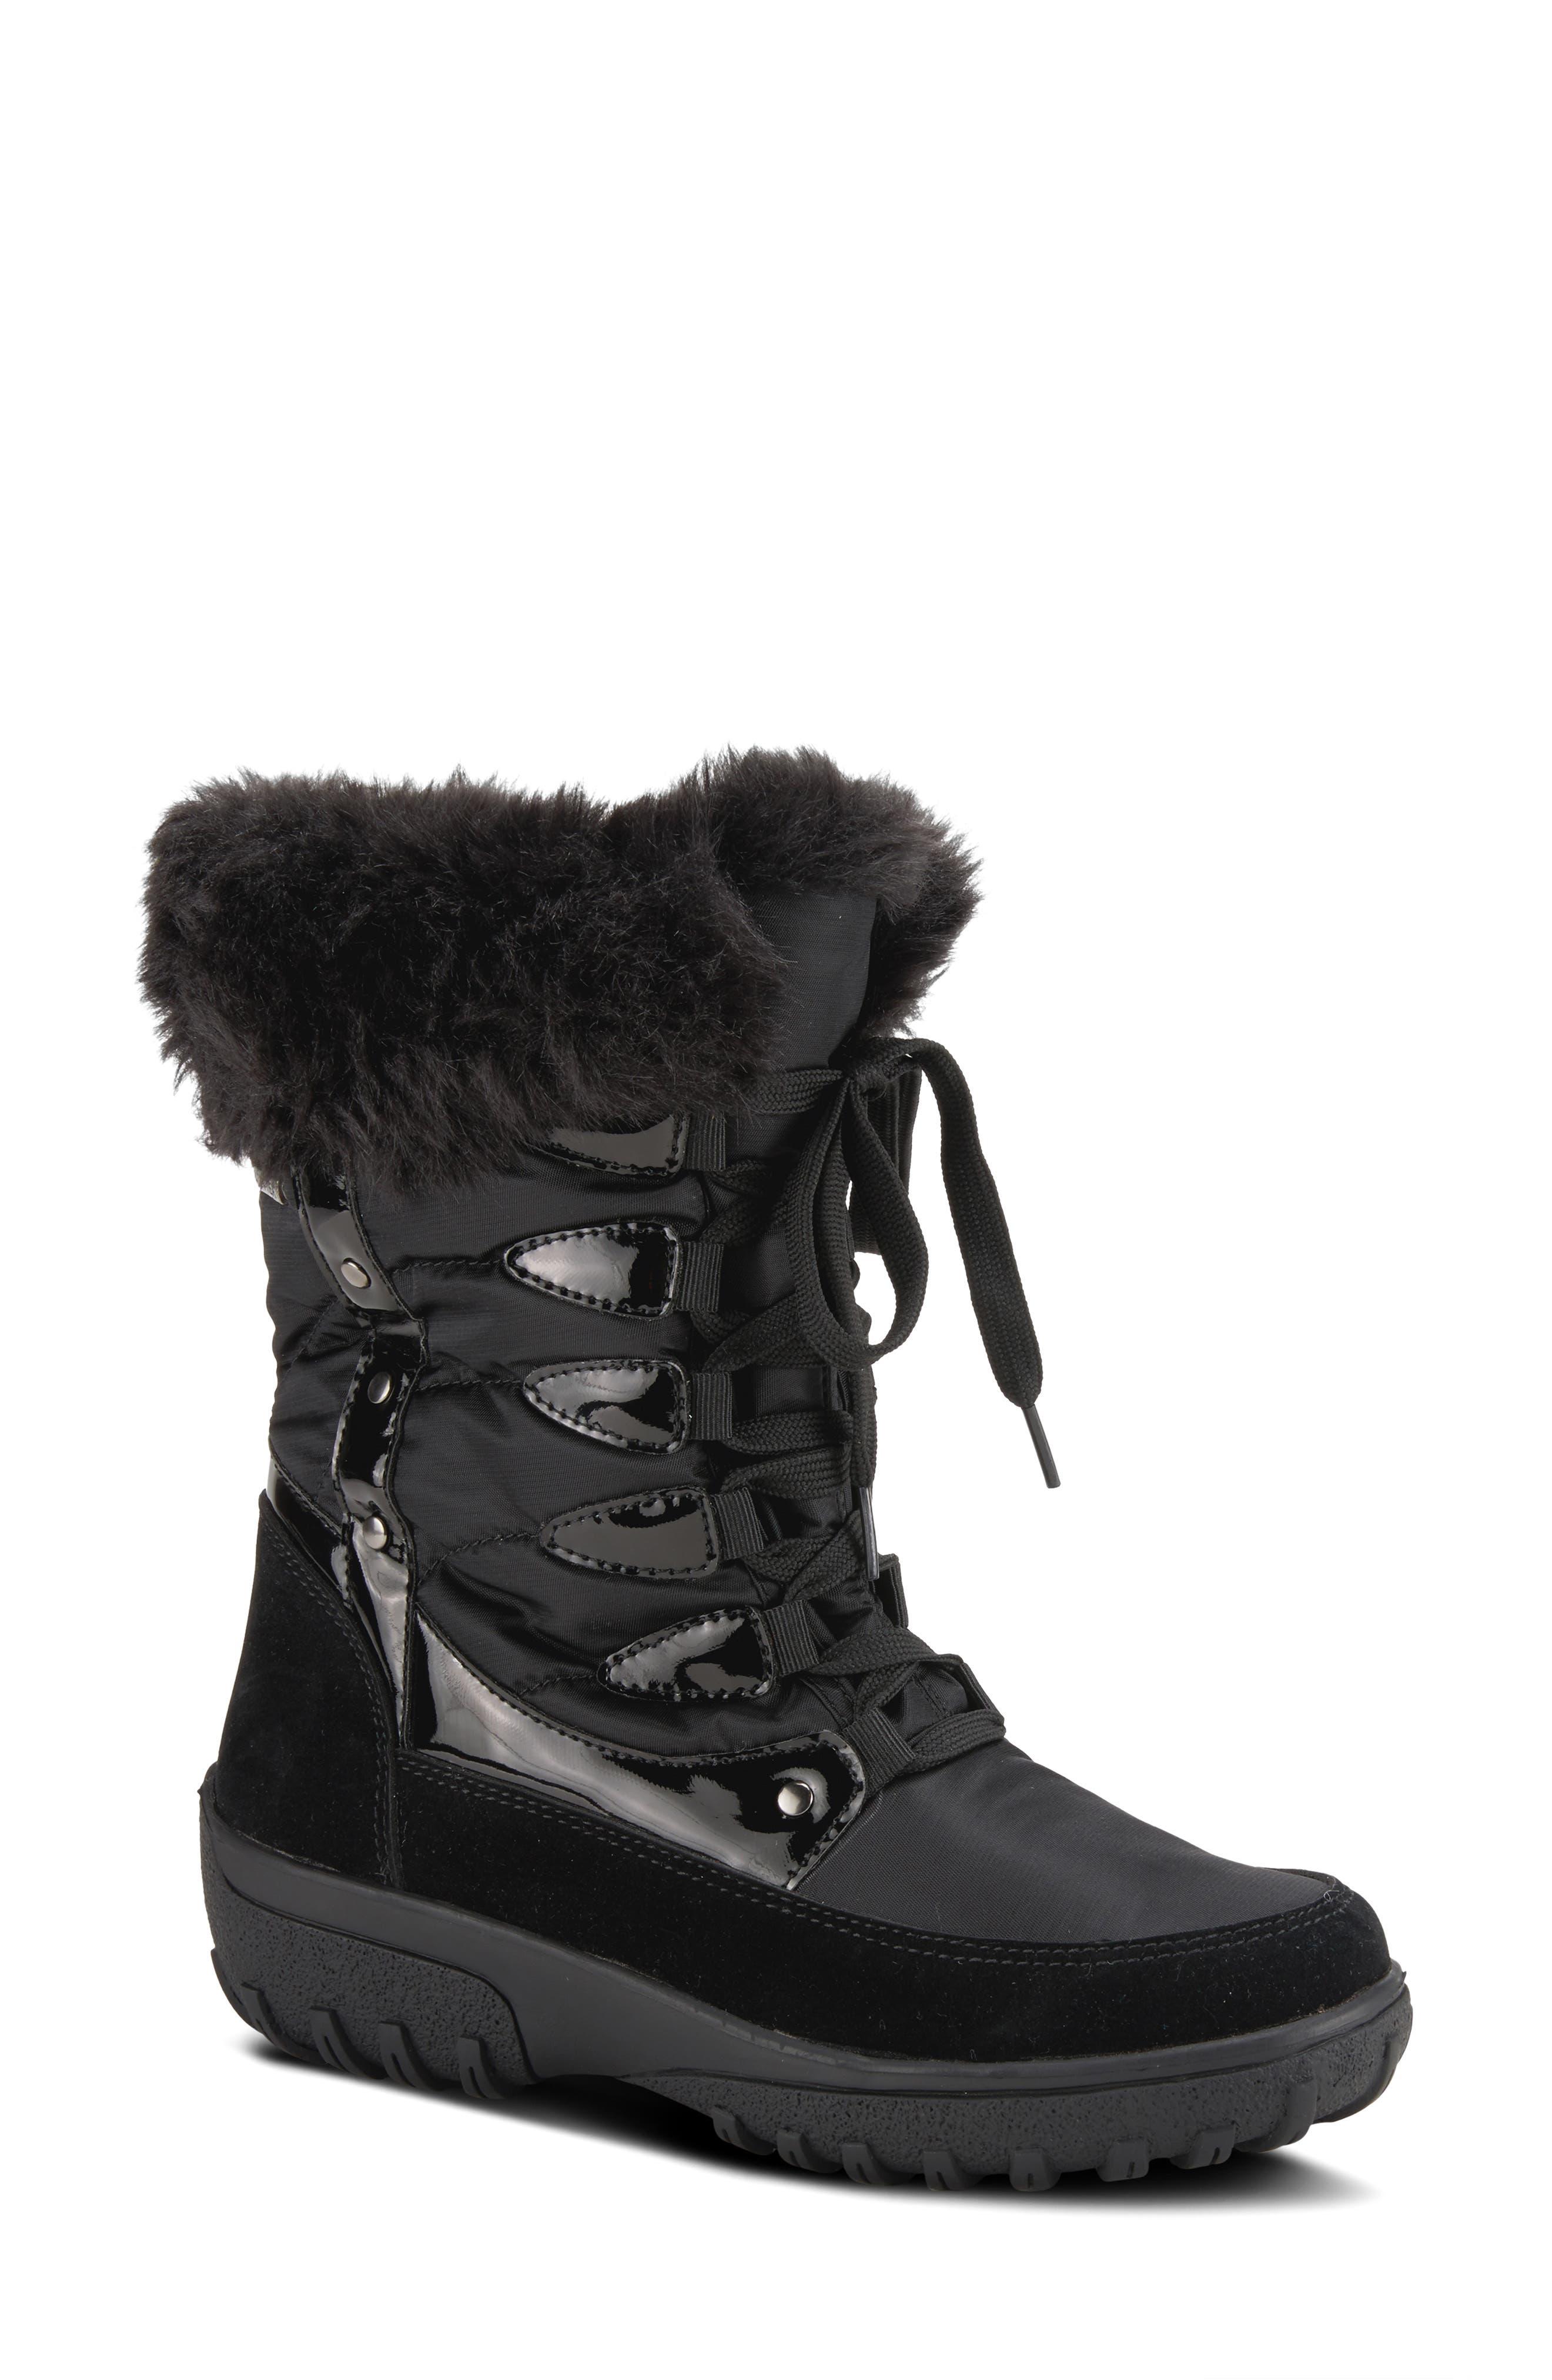 Stormy Waterproof Winter Boot